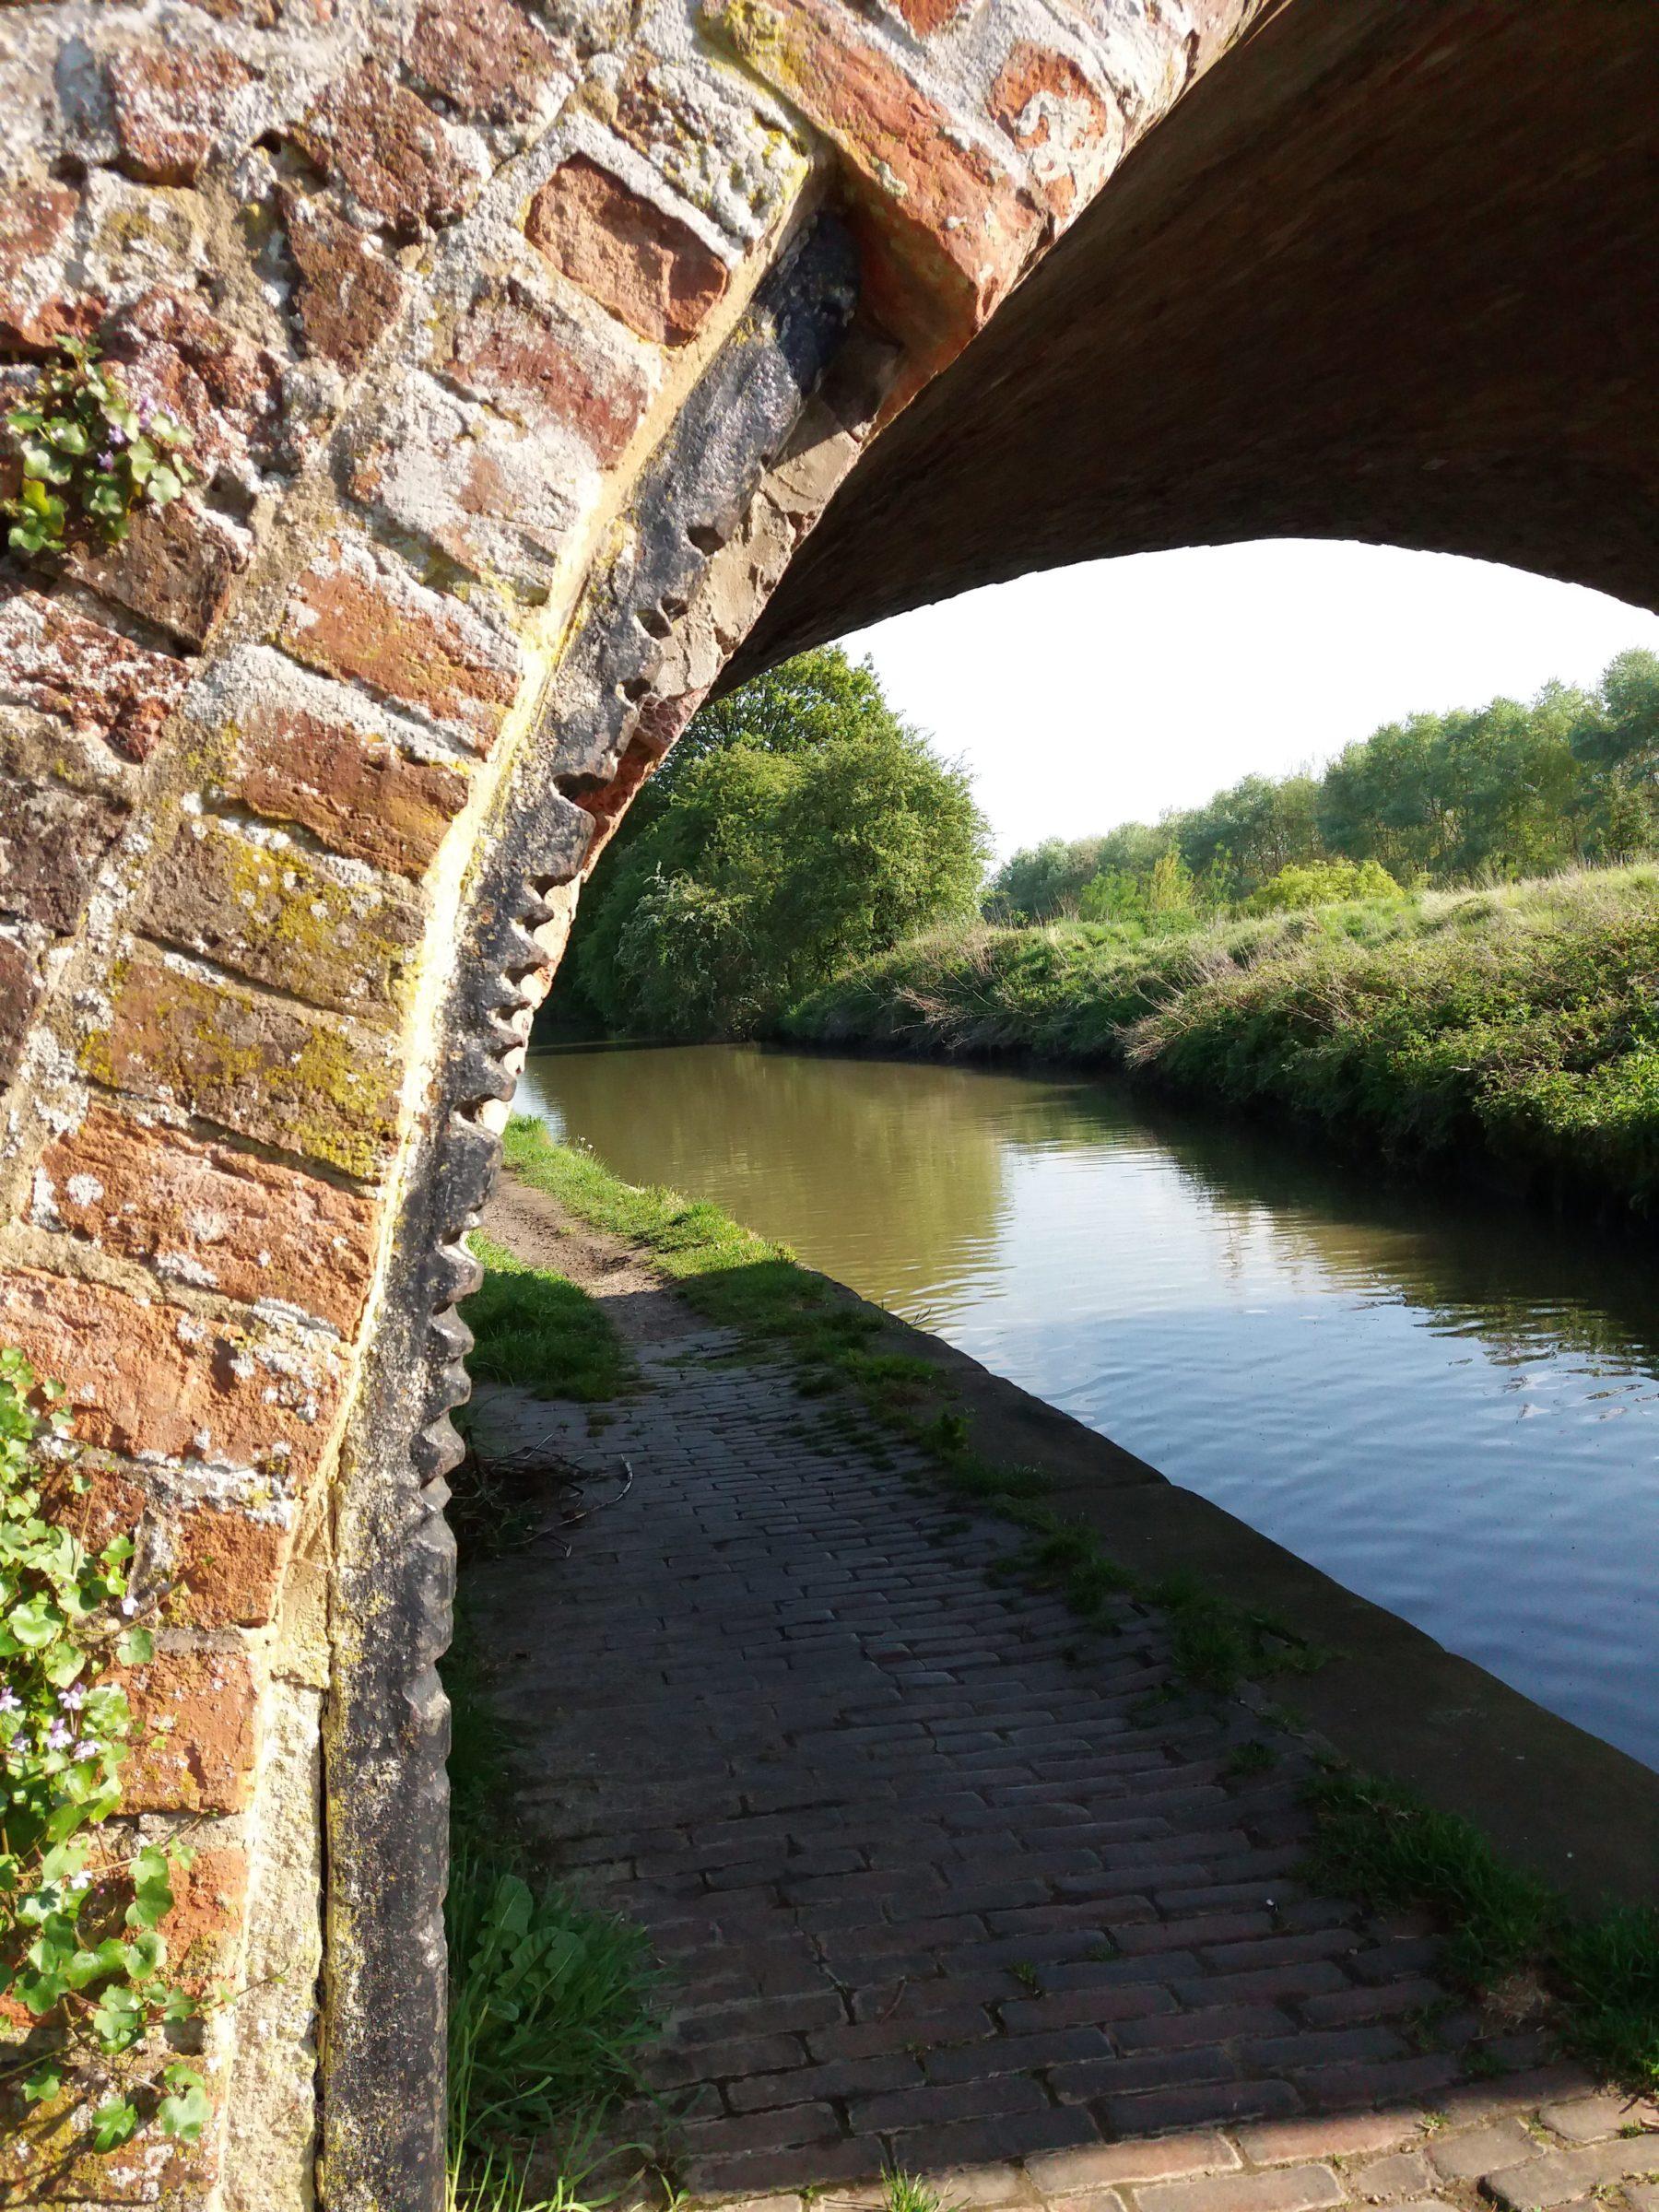 Rope Scored Bridge, Grand Union Canal, Whilton Locks Flight.